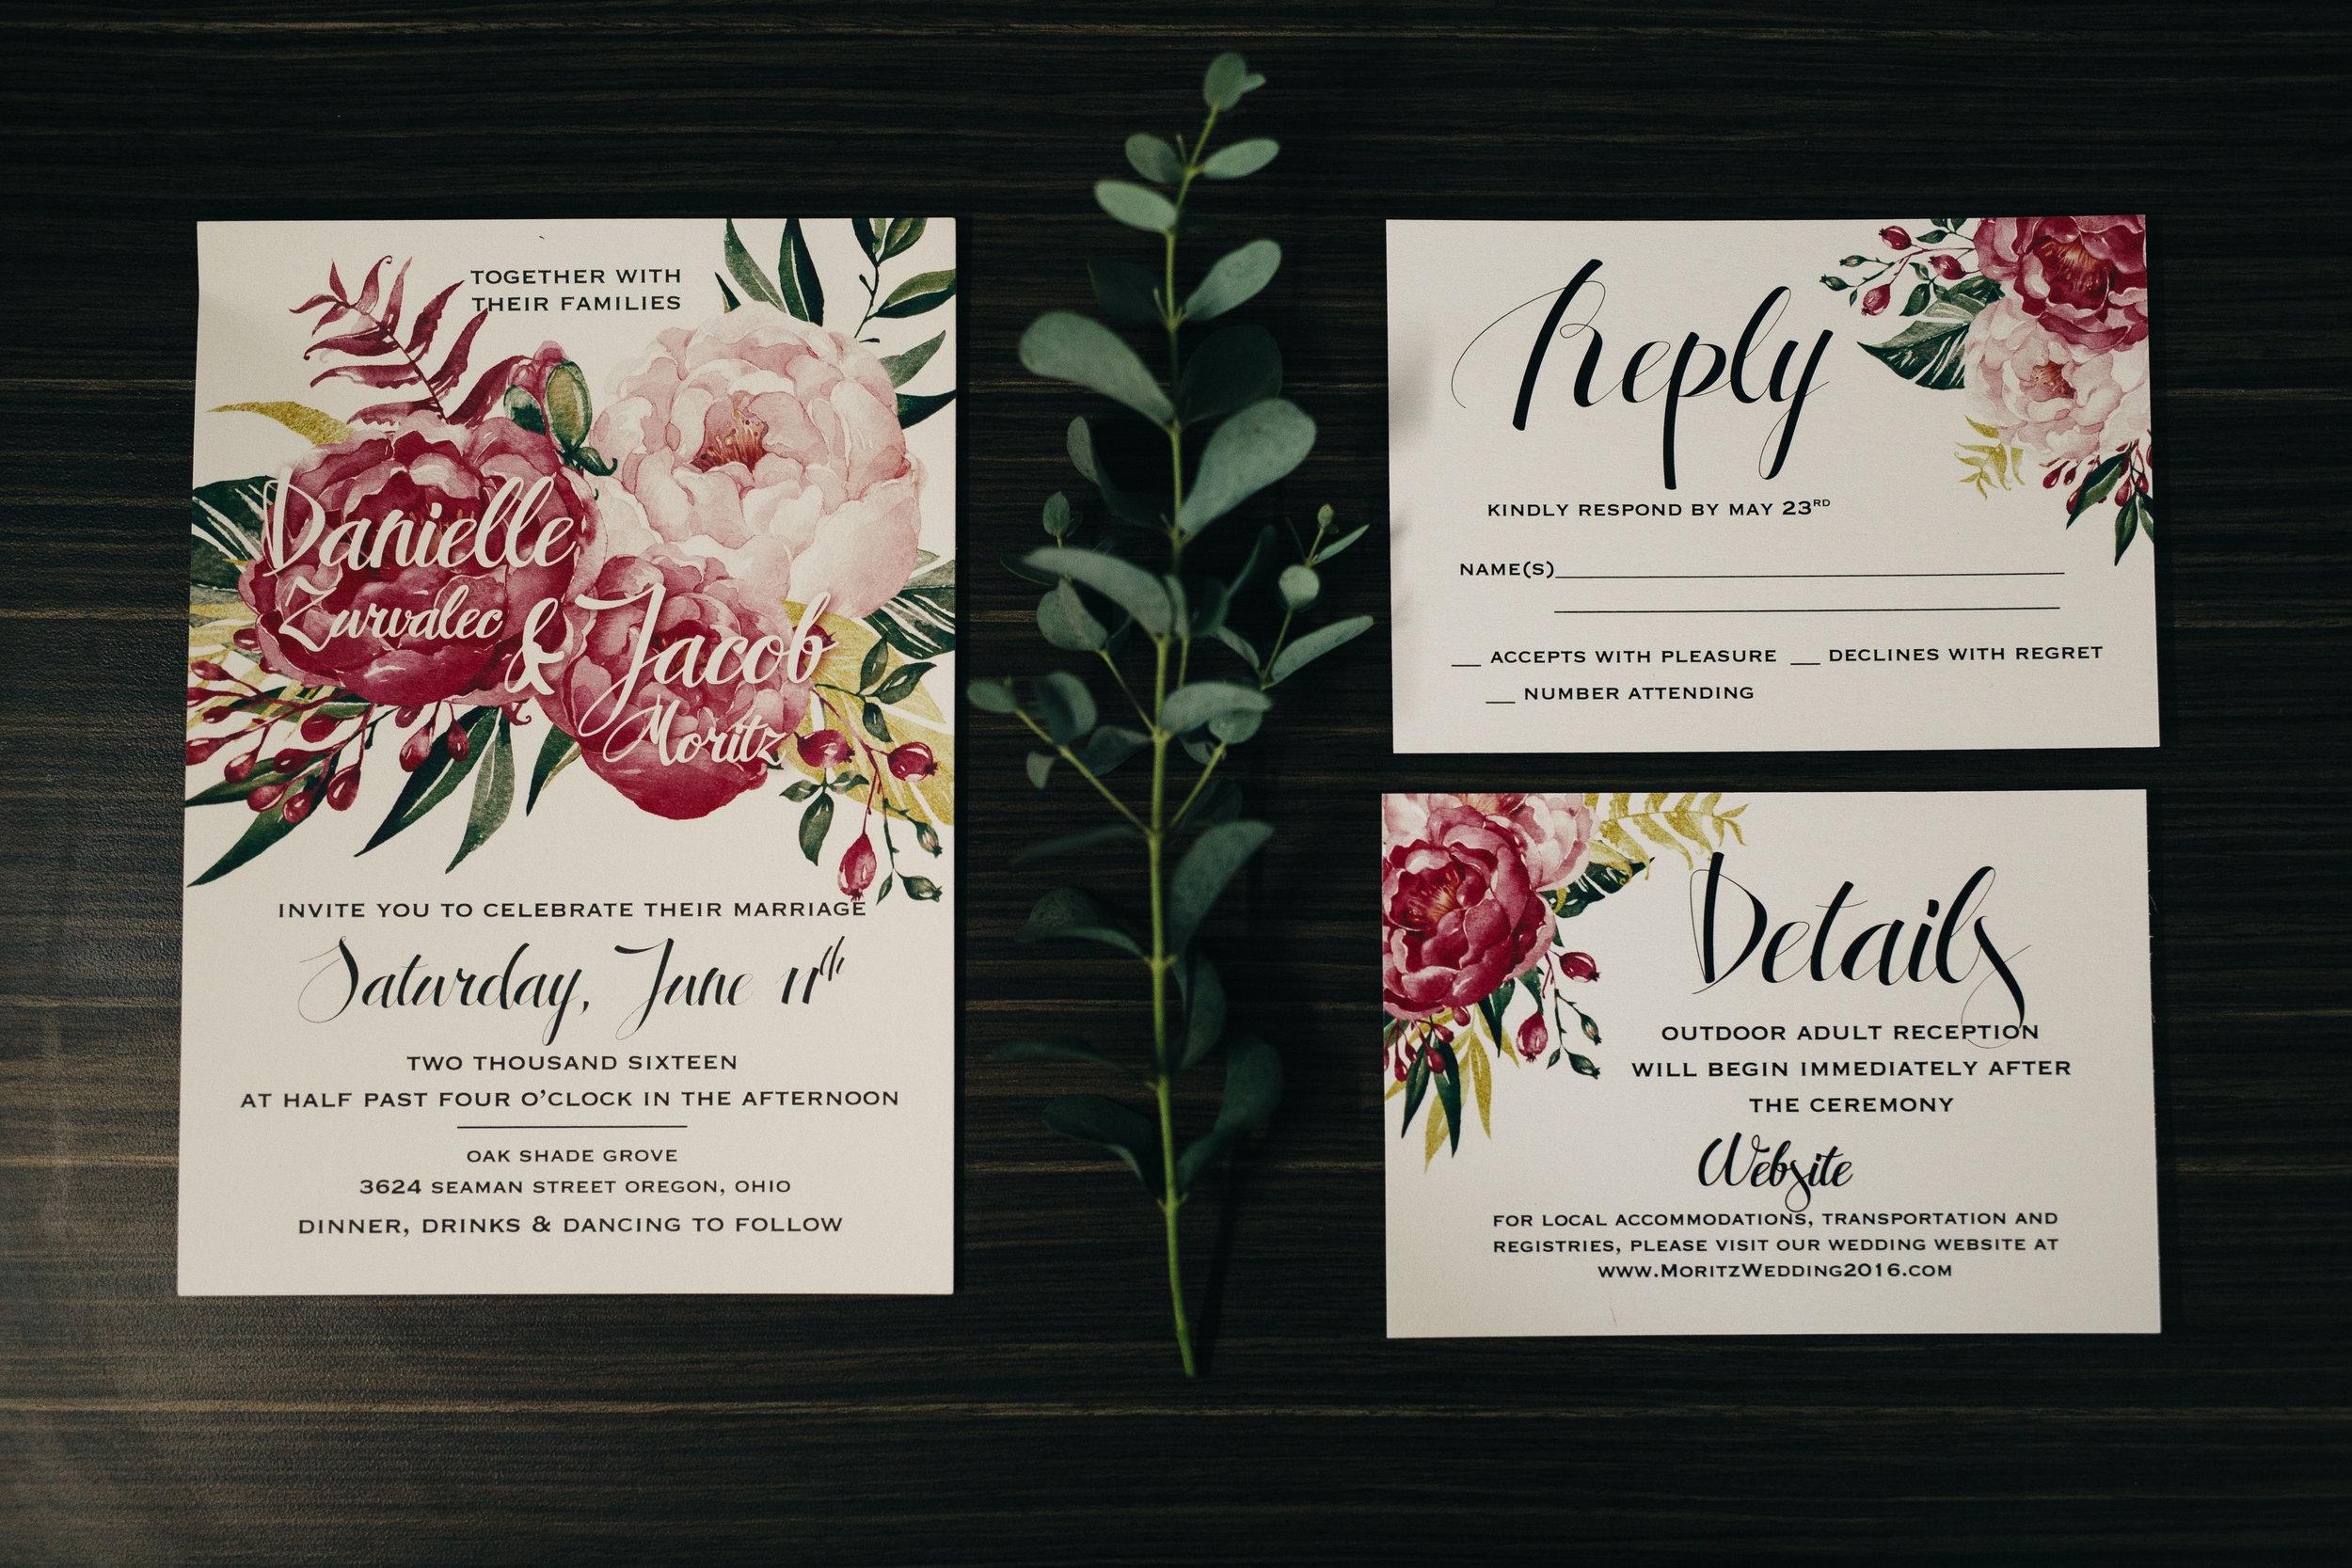 Wedding invitation suite with floral design for summer wedding.